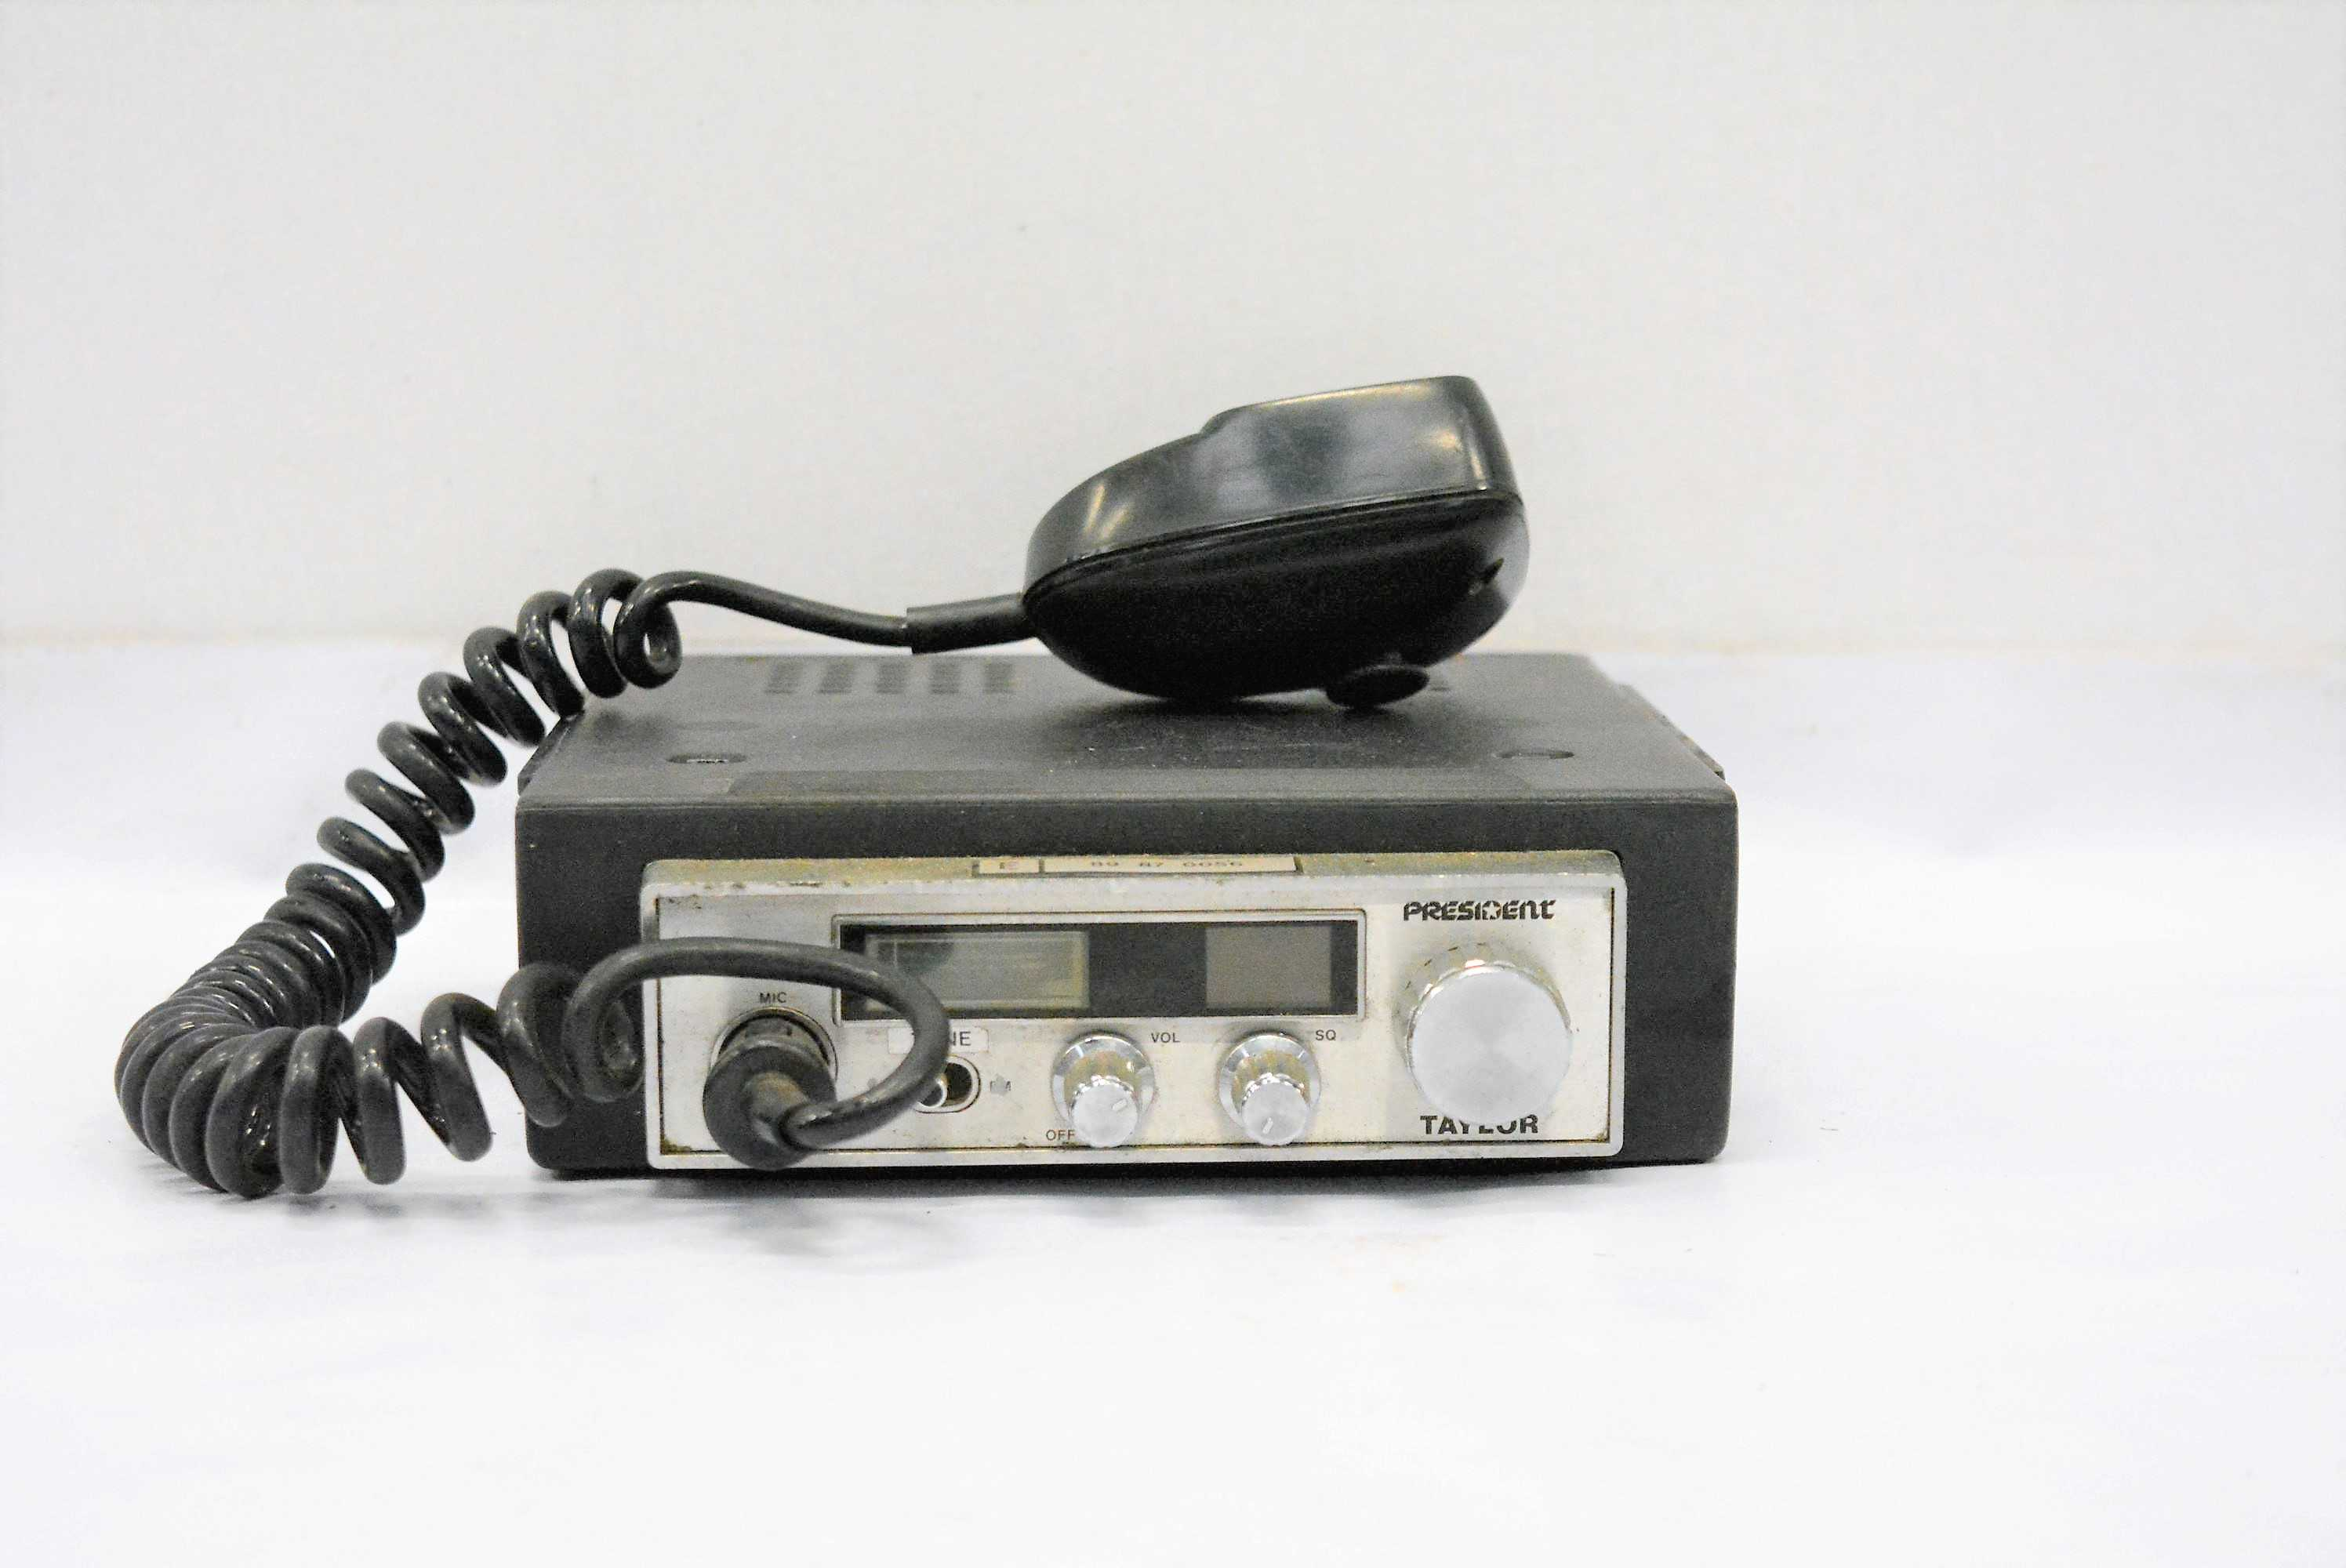 EMISORA DE RADIO MEDIANA